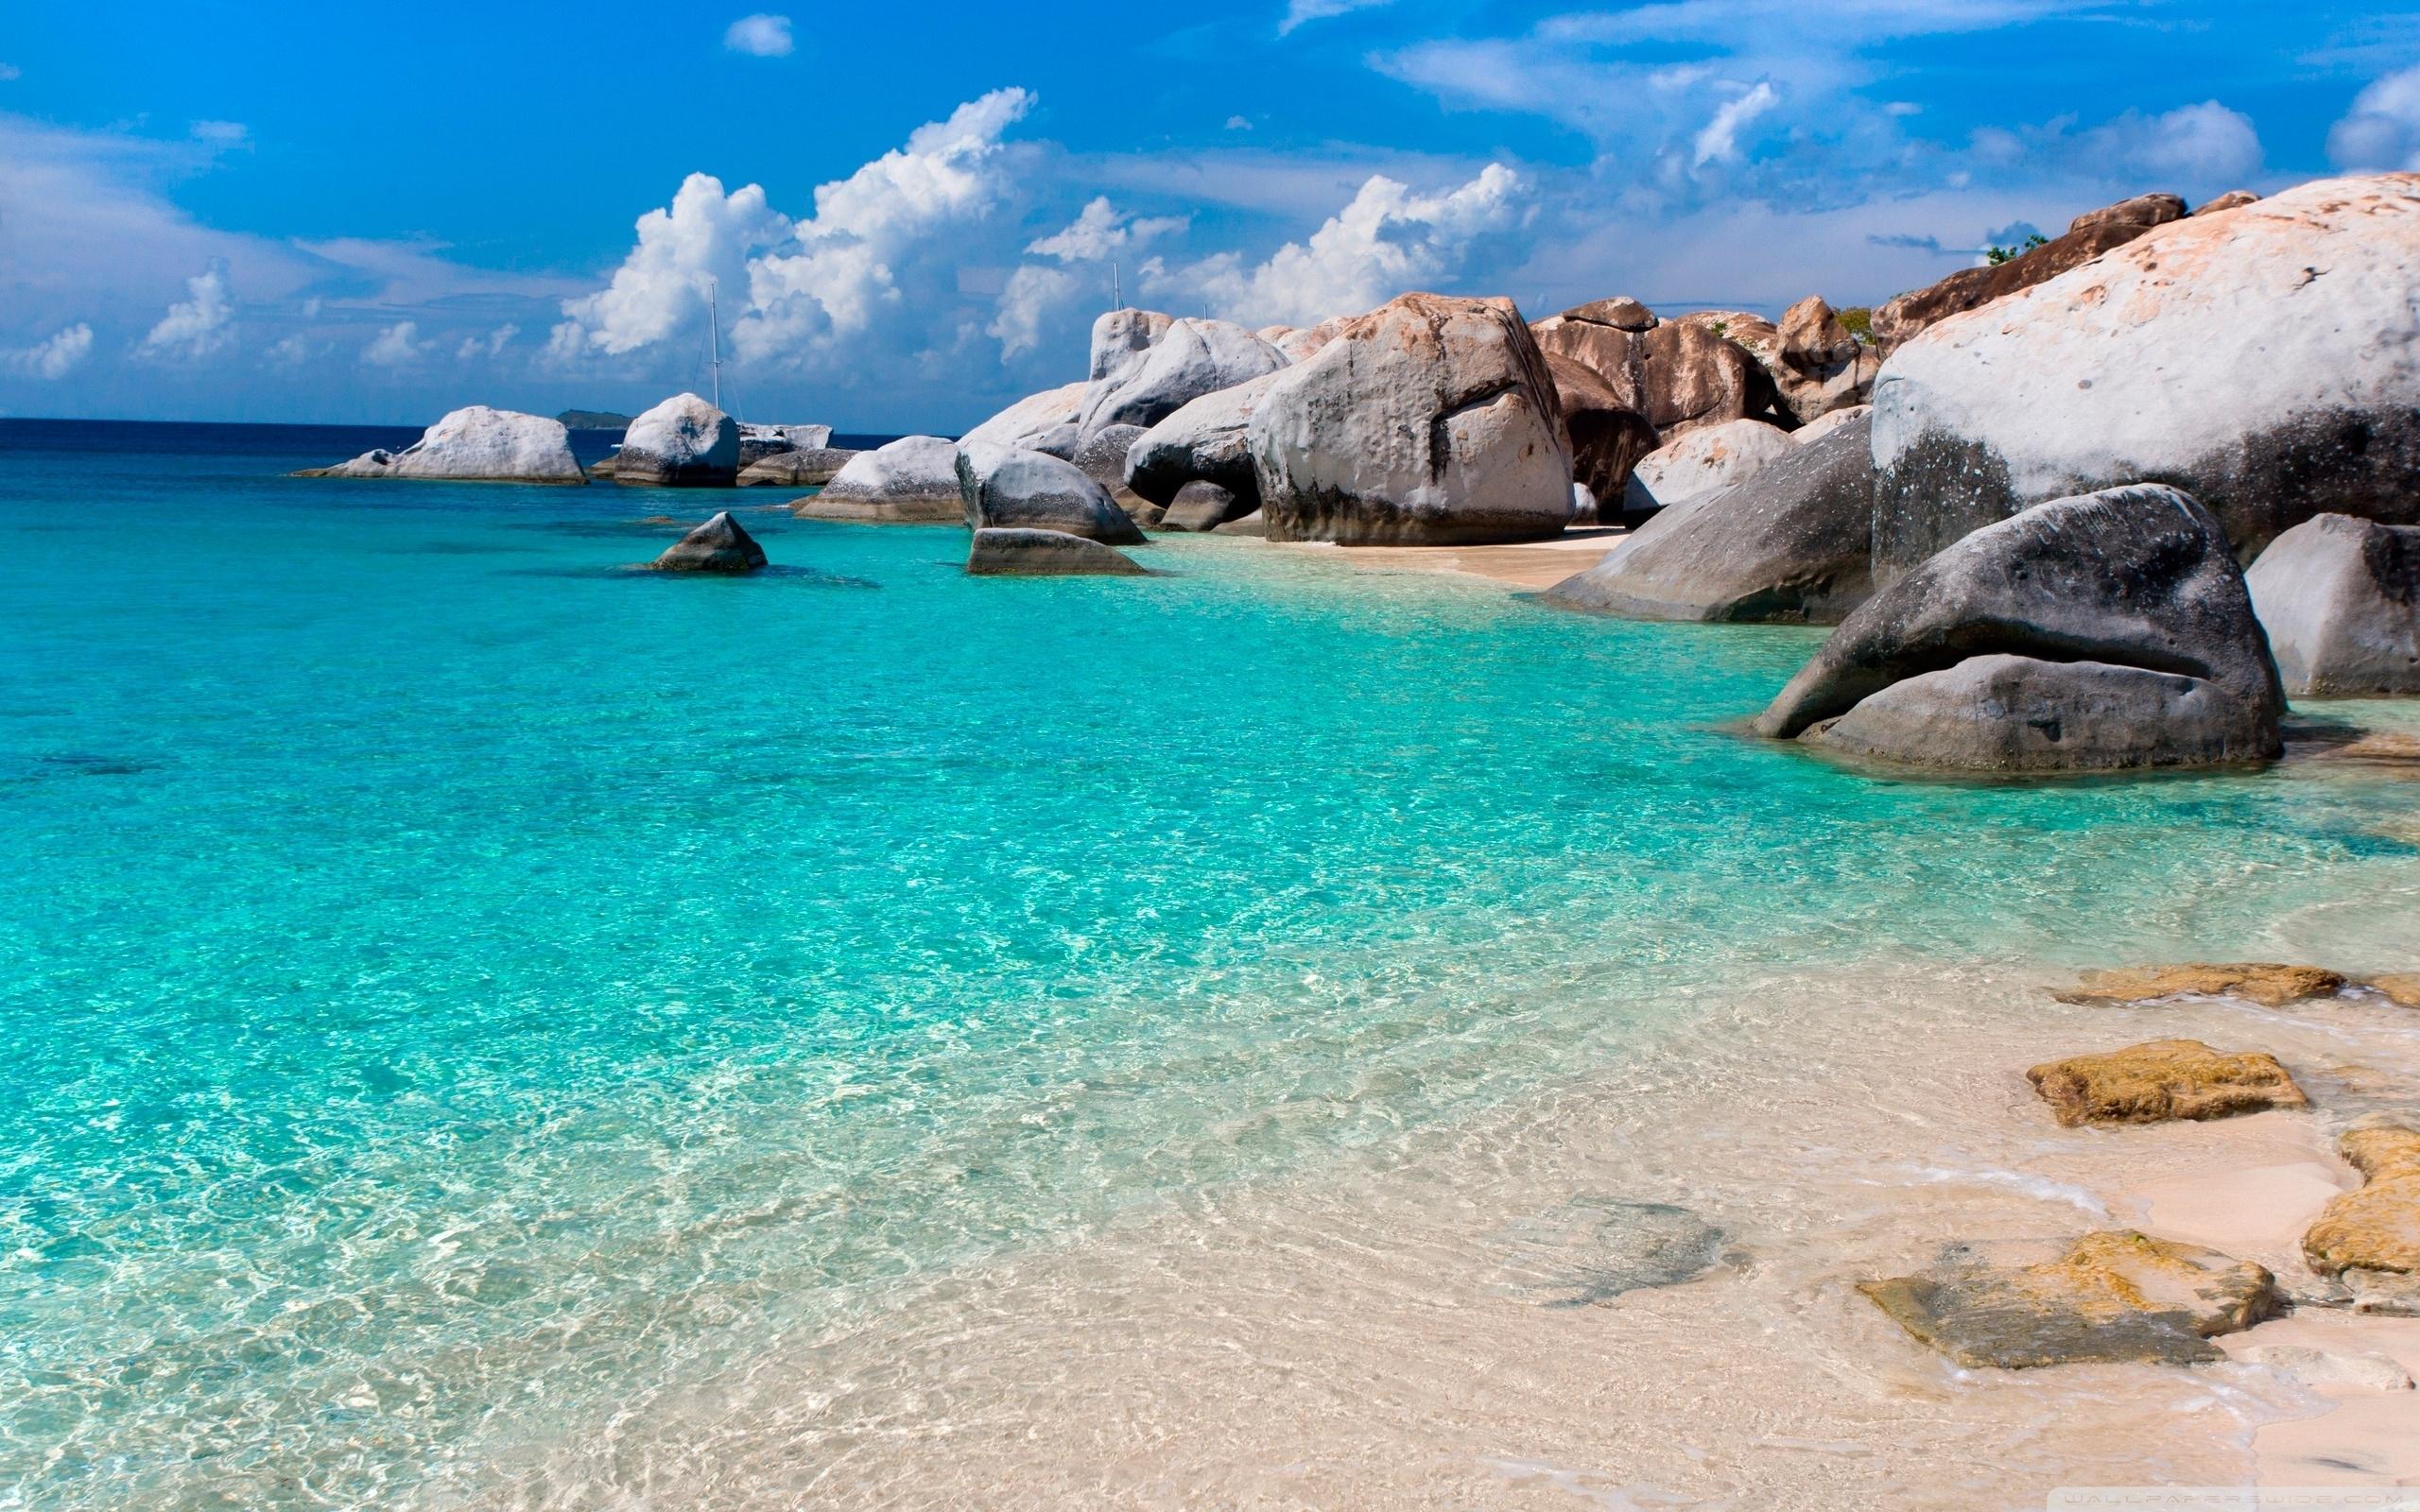 luxury beach summer wallpaper | the most beautiful beach wallpapers